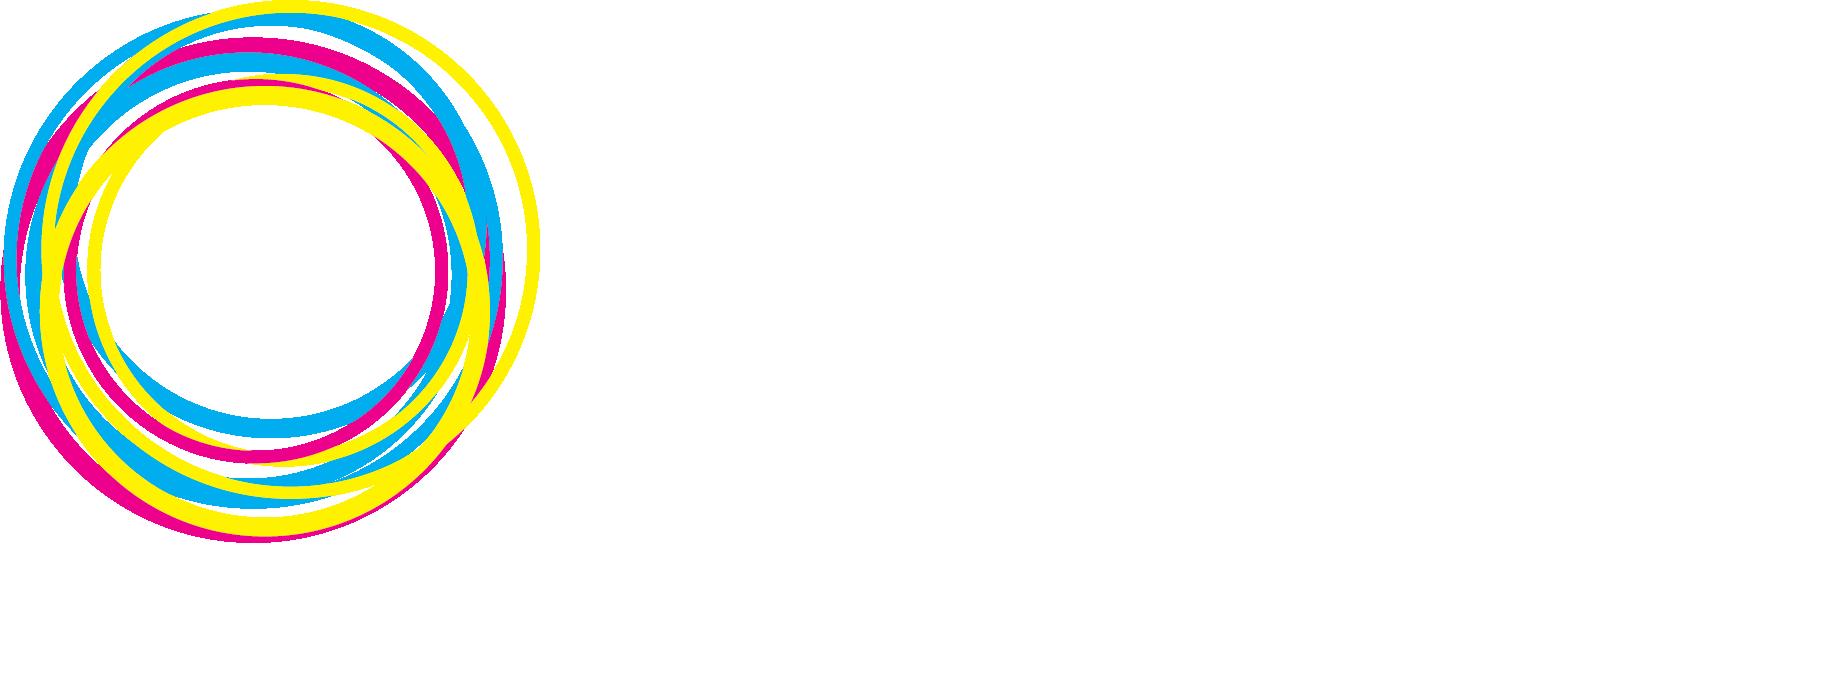 Greg Tapp Printing | Online Digital Printing Services